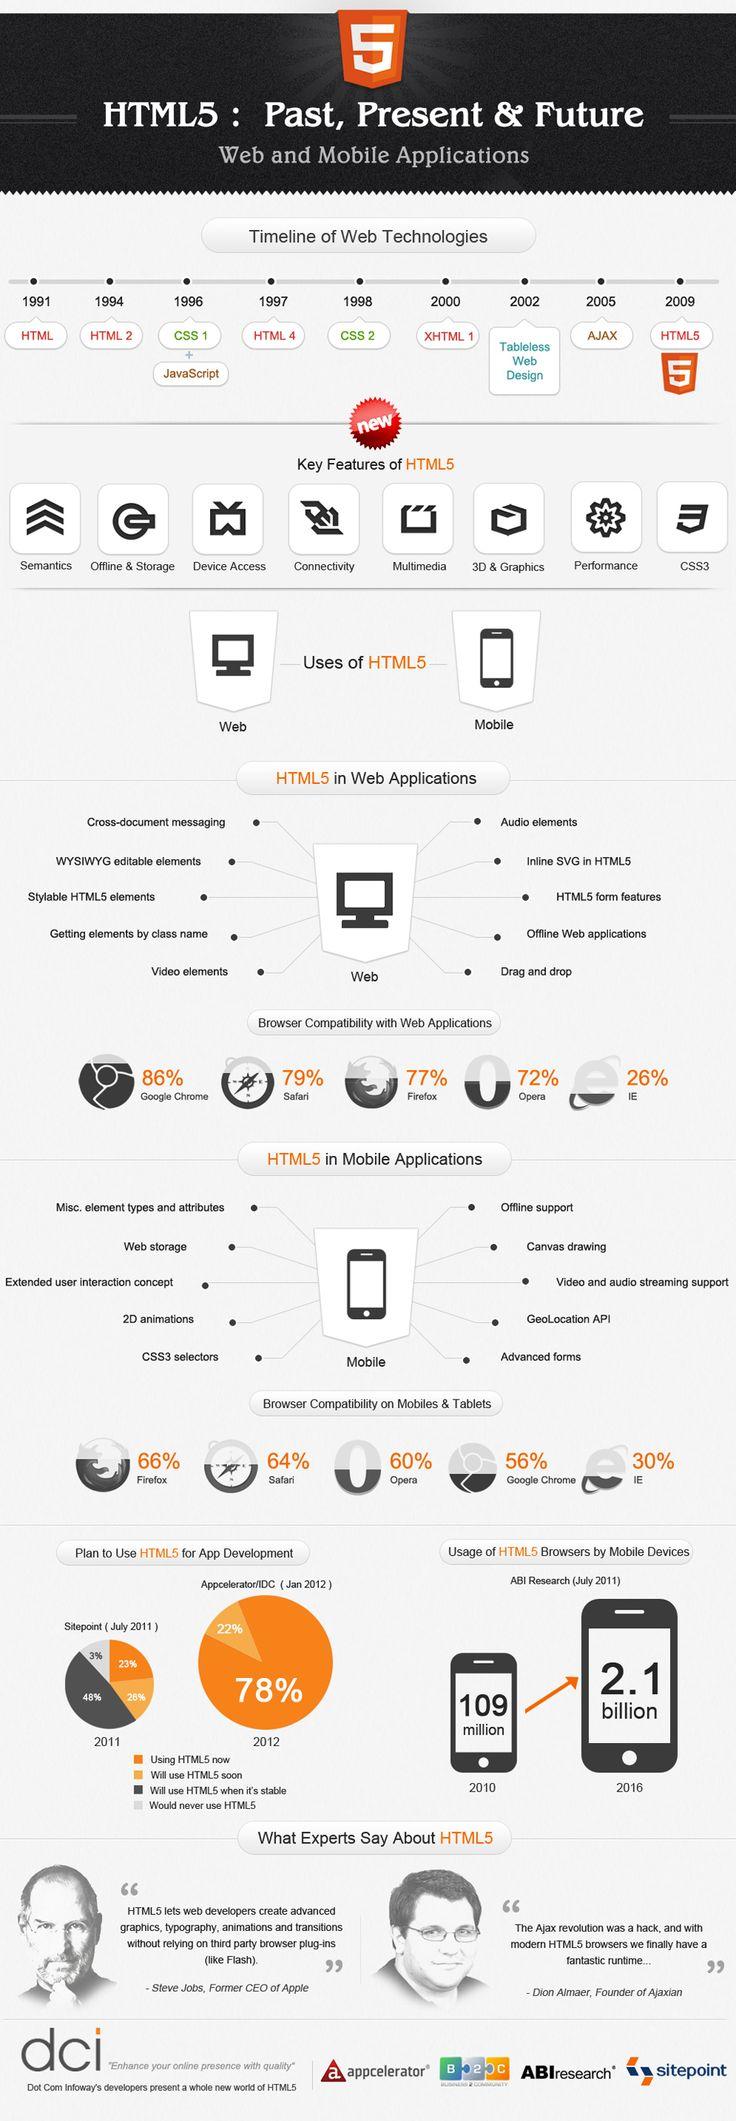 Html5 past, present, future infographic.    ----BTW, Please Visit:  http://artcaffeine.imobileappsys.com